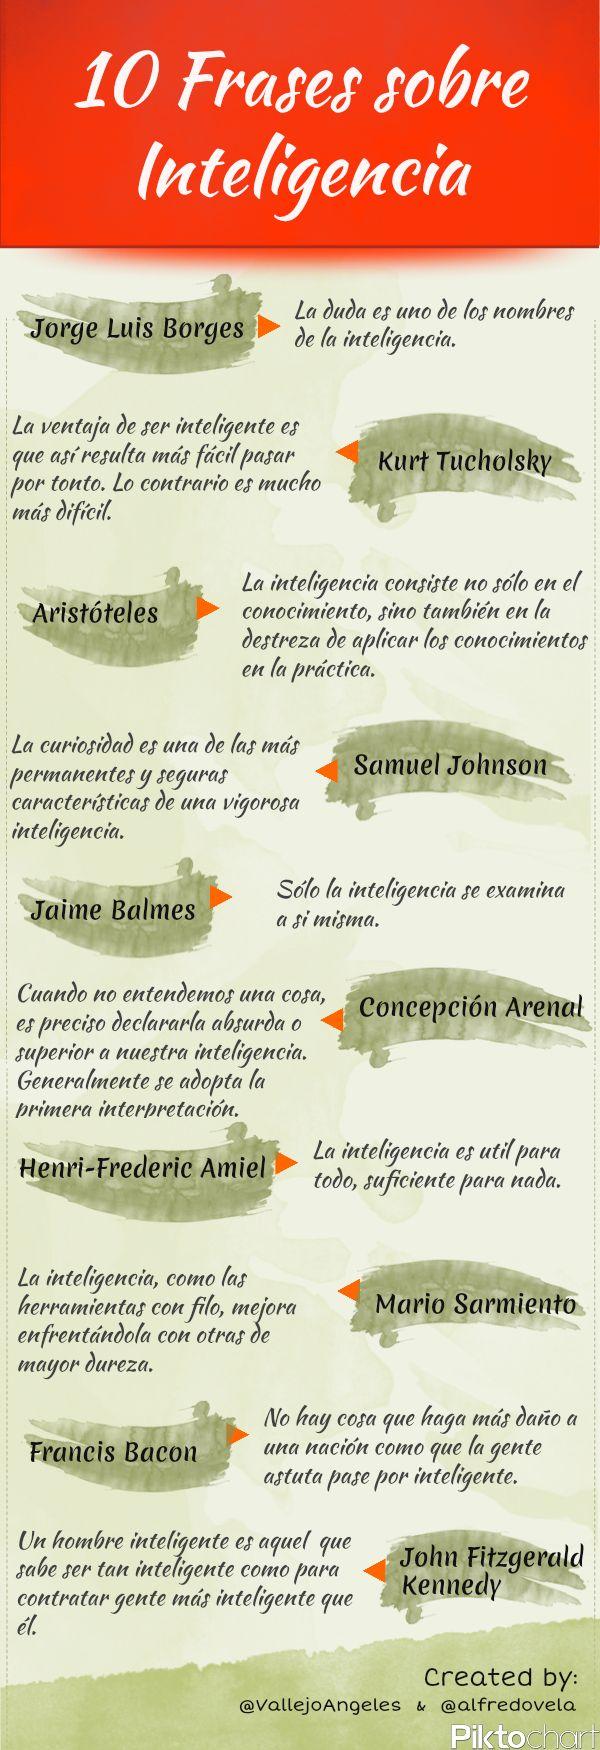 10 citas célebres sobre inteligencia http://ticsyformacion.com/2012/09/13/10-citas-celebres-sobre-inteligencia-infografia-infographic-citas-quotes/